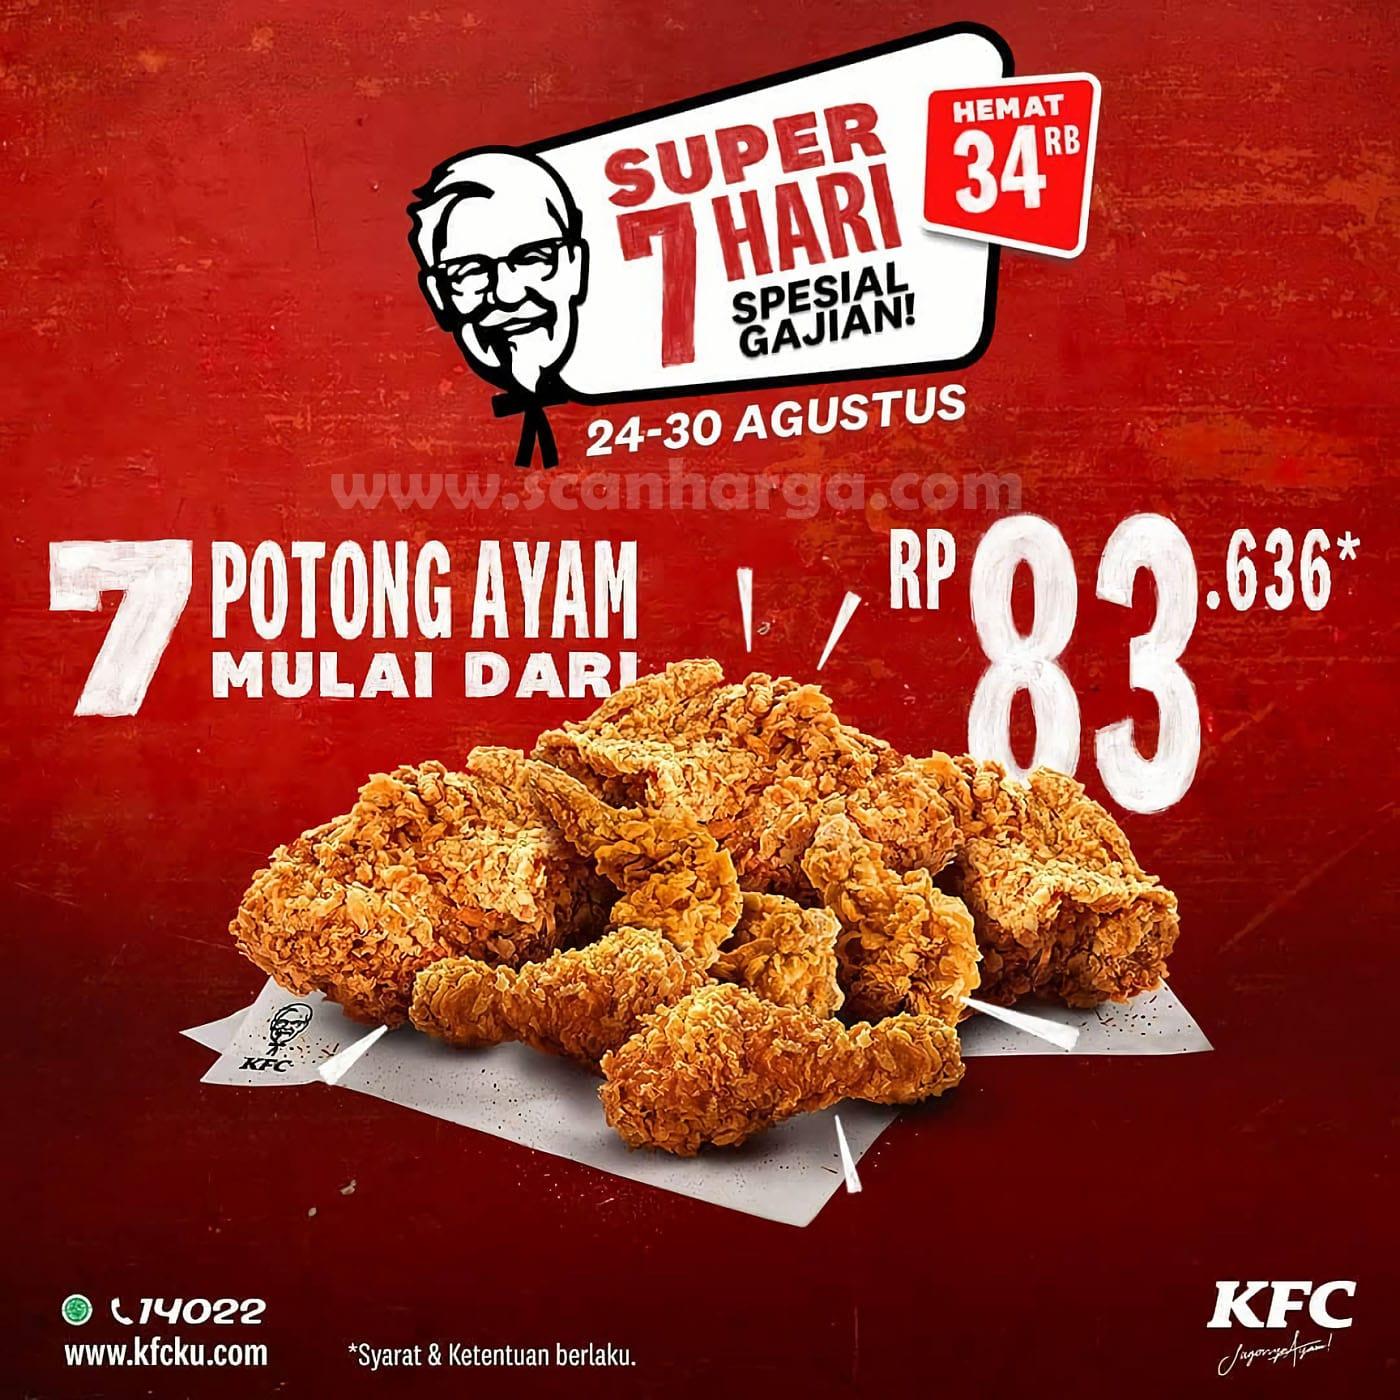 Promo KFC Spesial Gajian Super 7 Hari - 7 Potong Ayam Rp 83.636 Periode 24 - 30 Agustus 2020